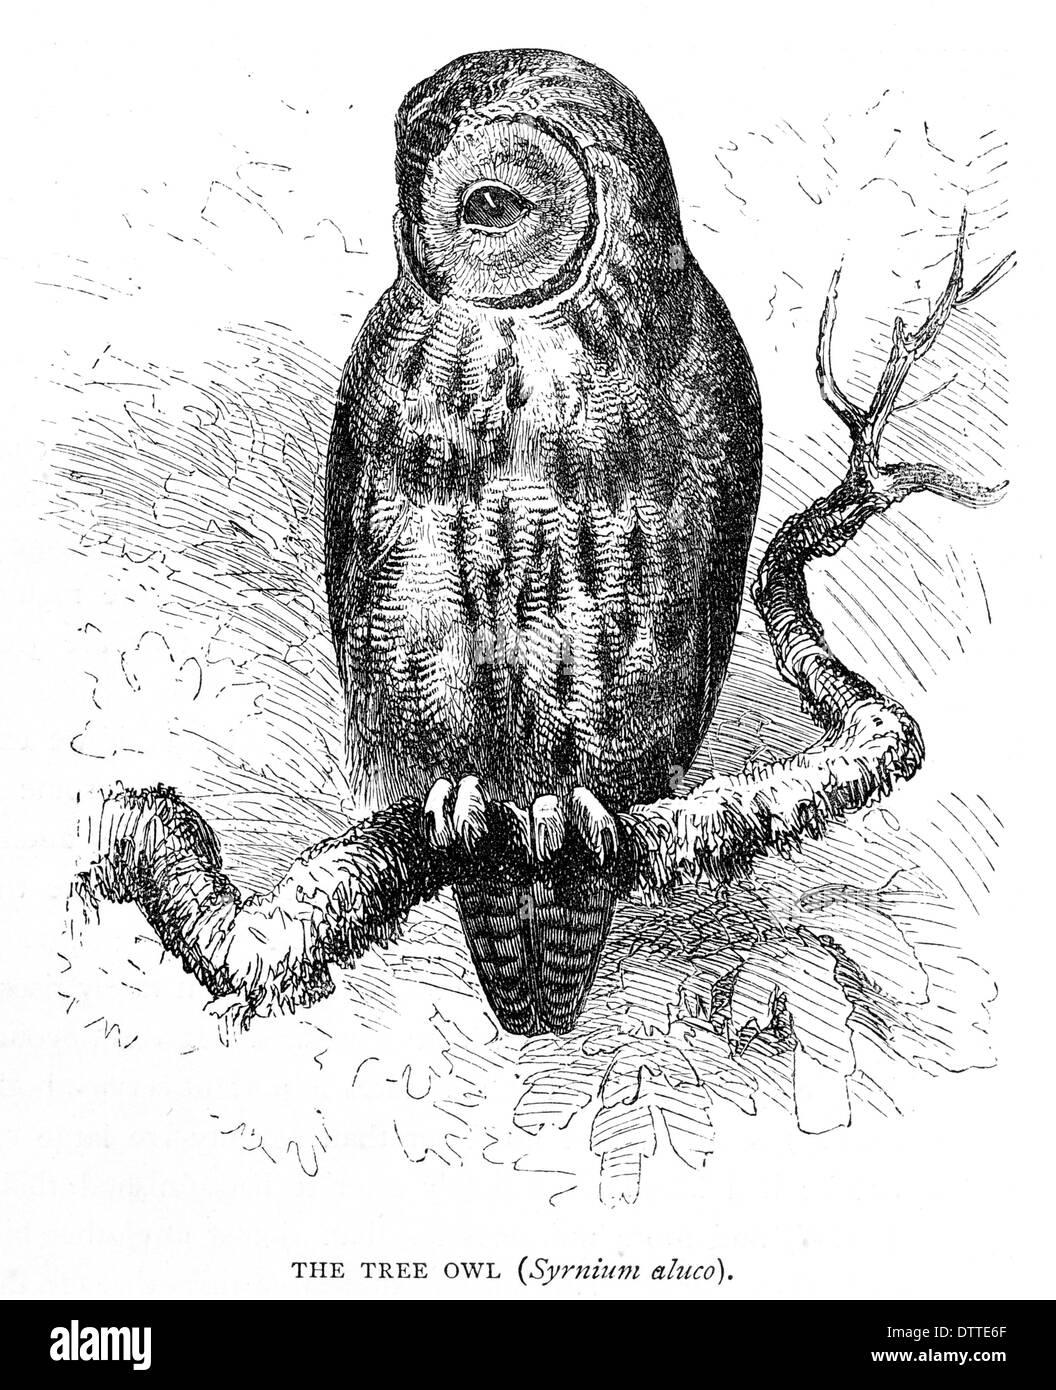 Baum Owl Syrnium aluco Stockbild